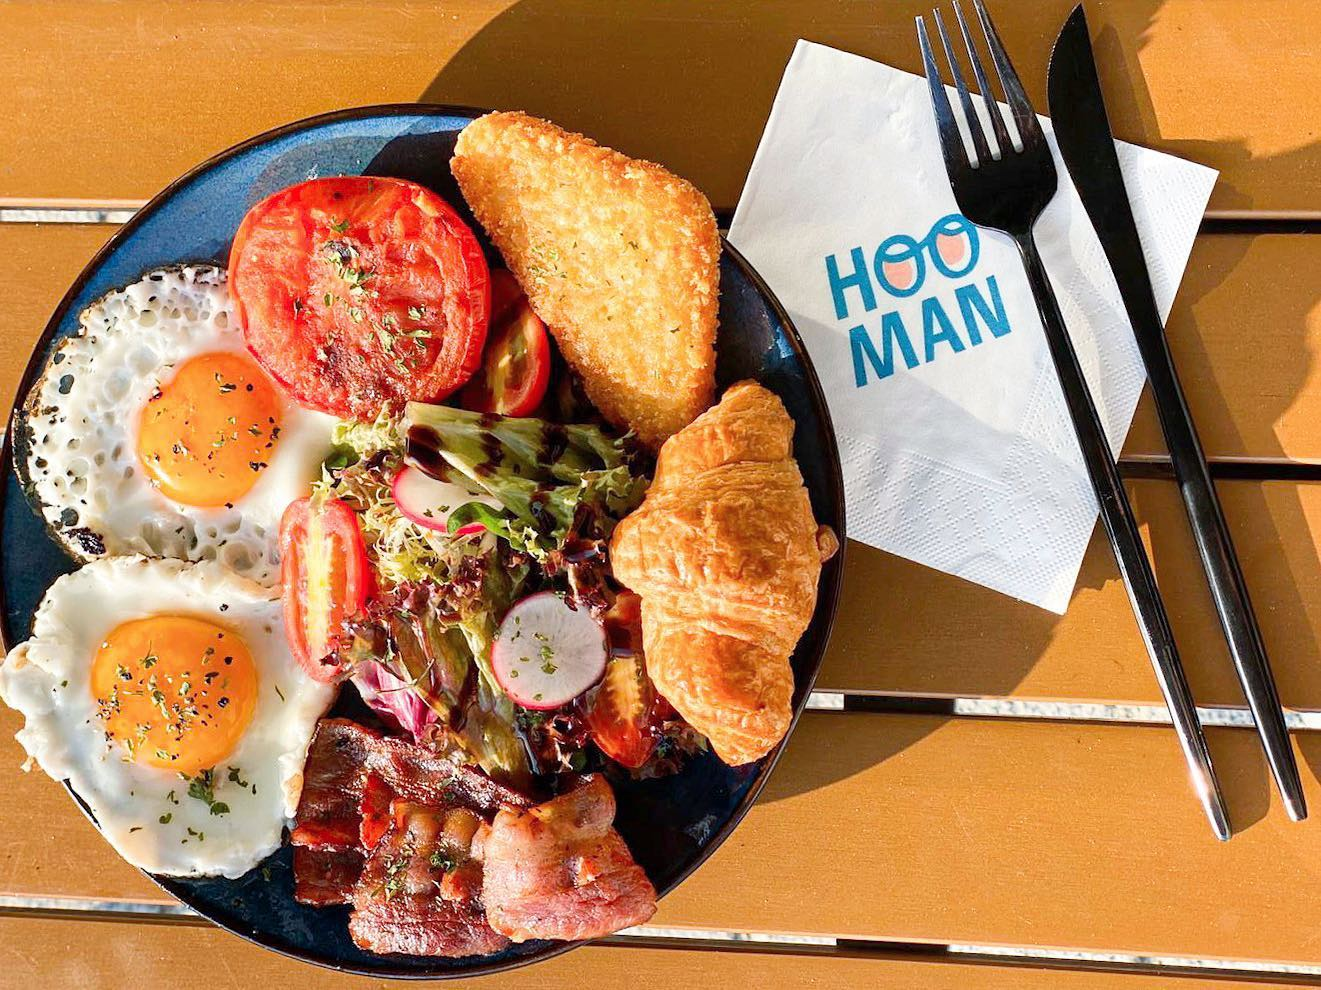 Hooman by the sea cafe hong kong